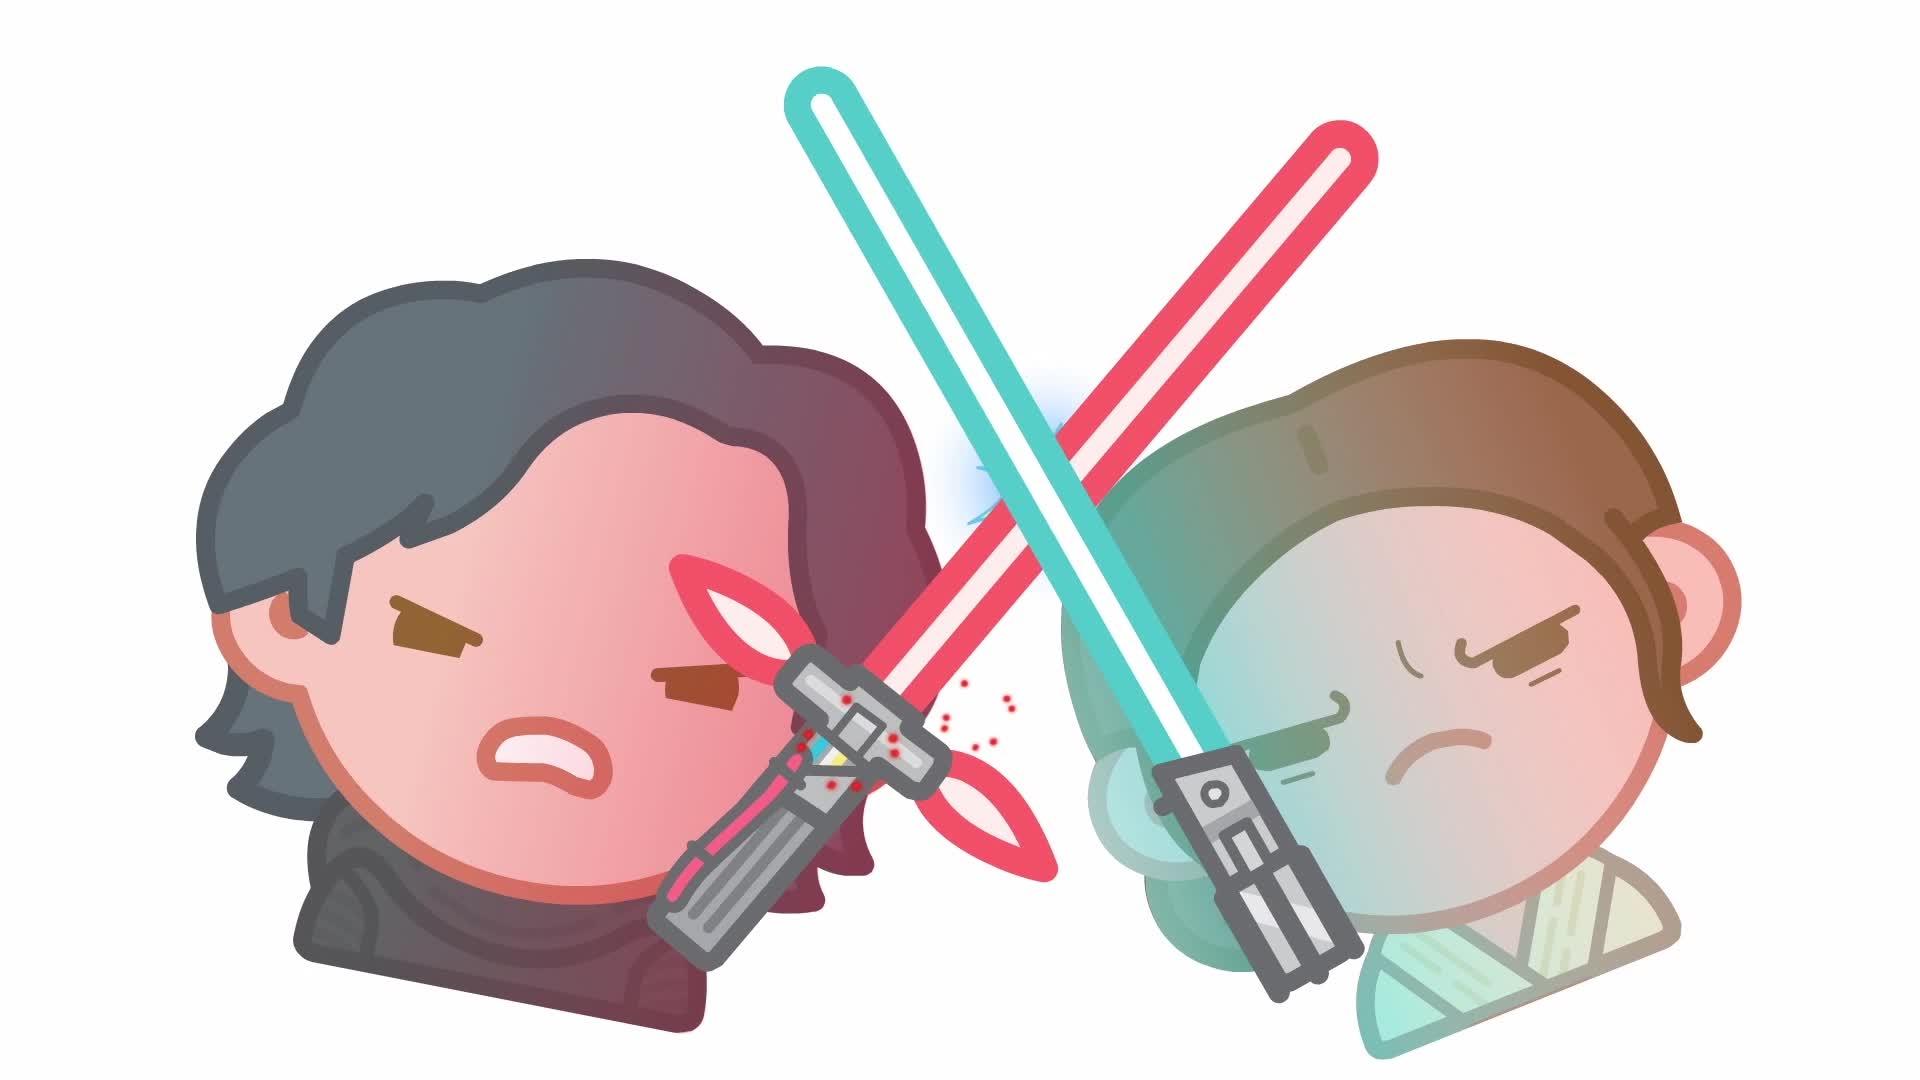 Star Wars η Δύναμη Ξυπνάει όπως θα το έλεγαν τα Emoji